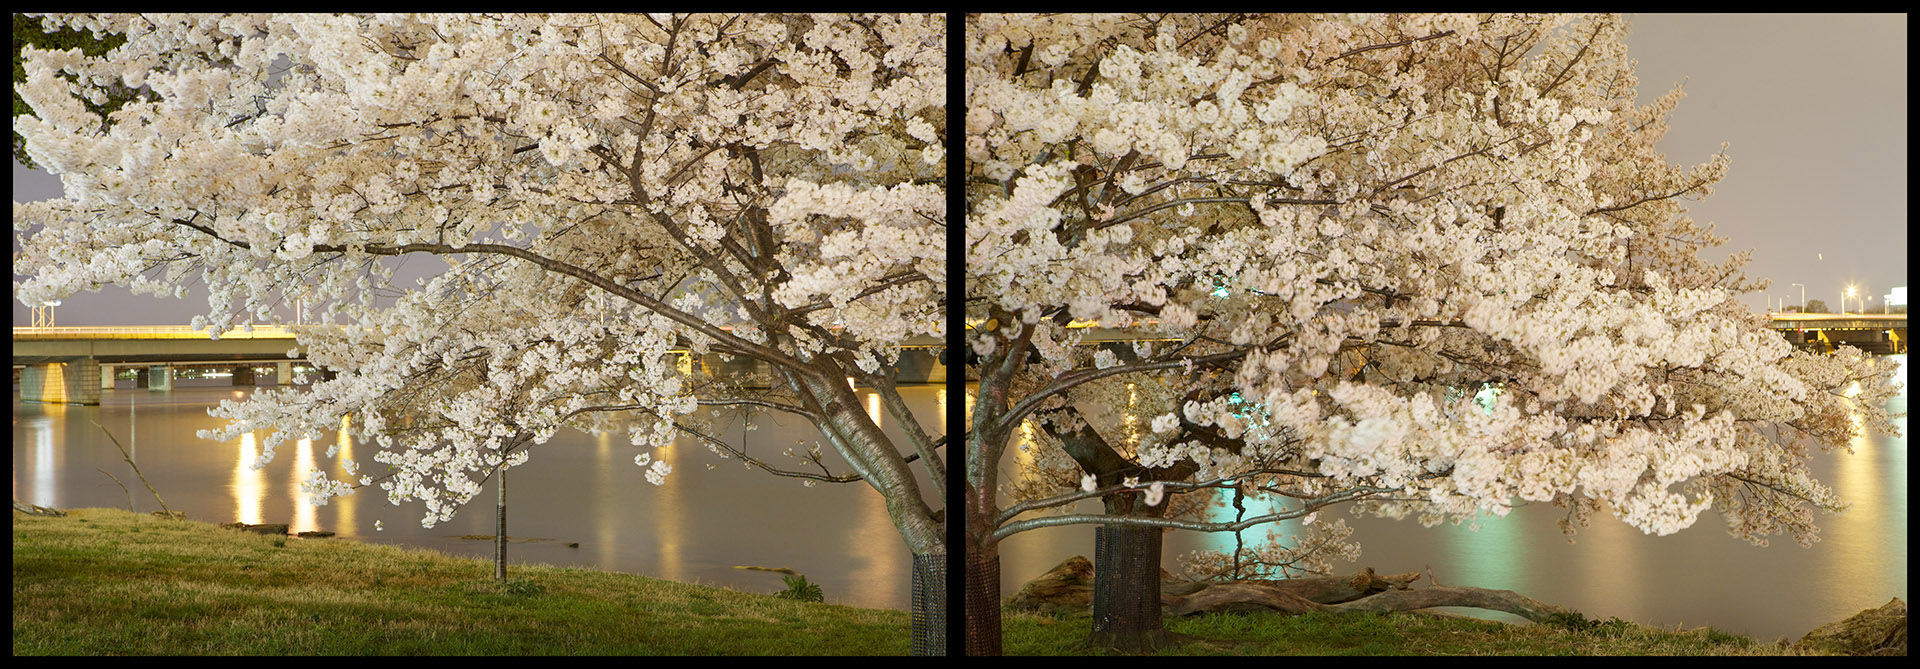 Cherry Blossom Diptych